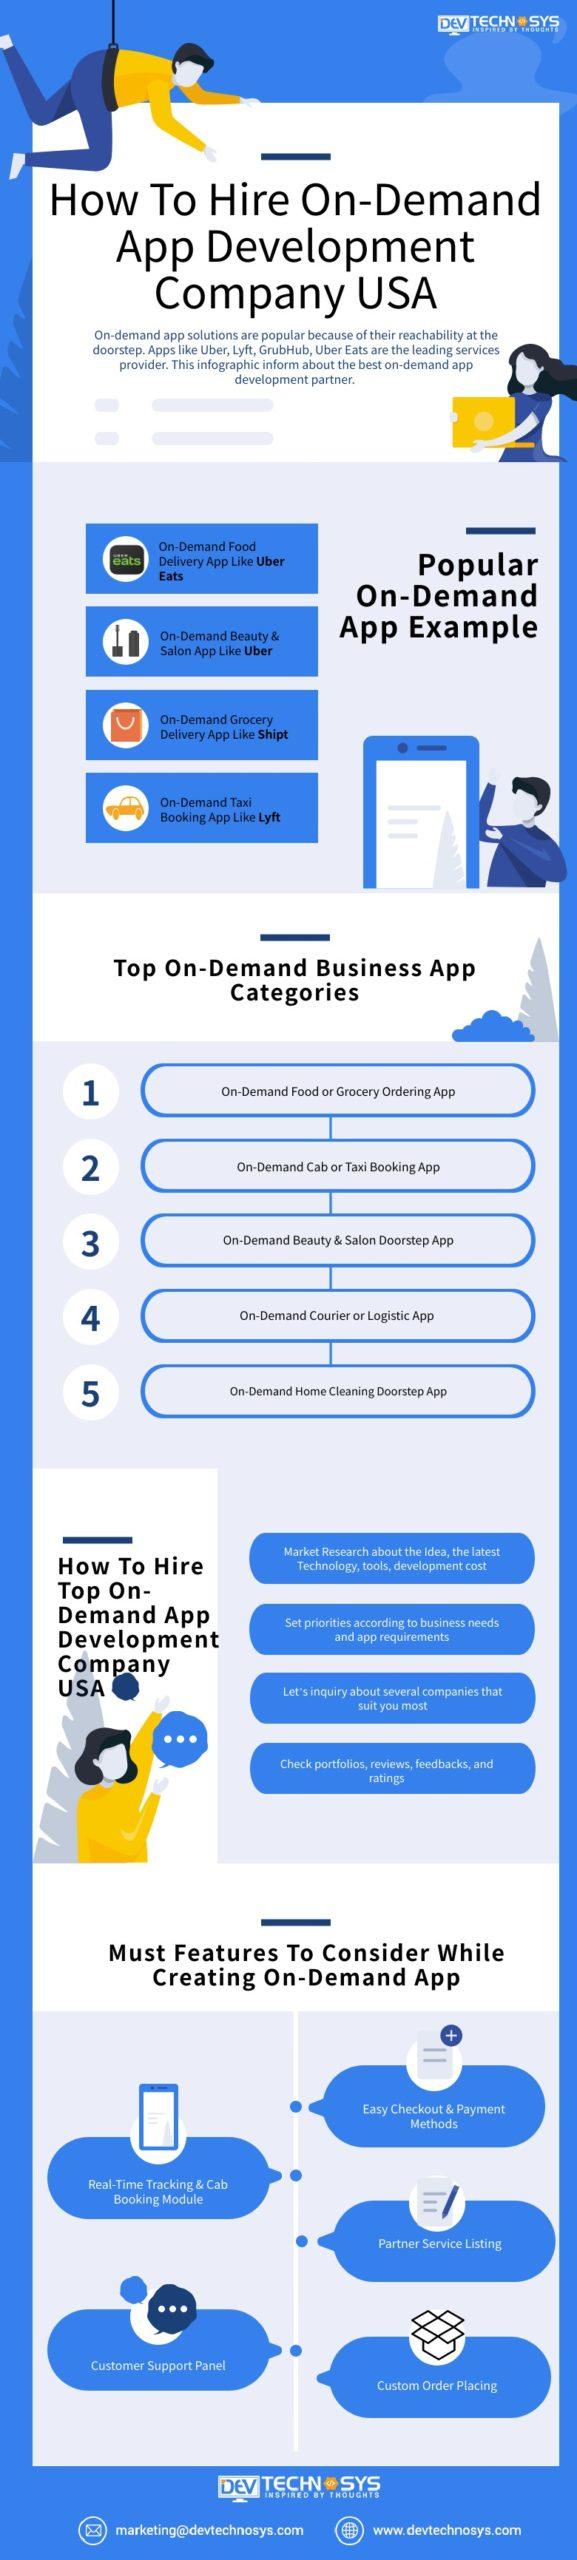 how-to-hire-on-demand-app-development-company-usa_orig